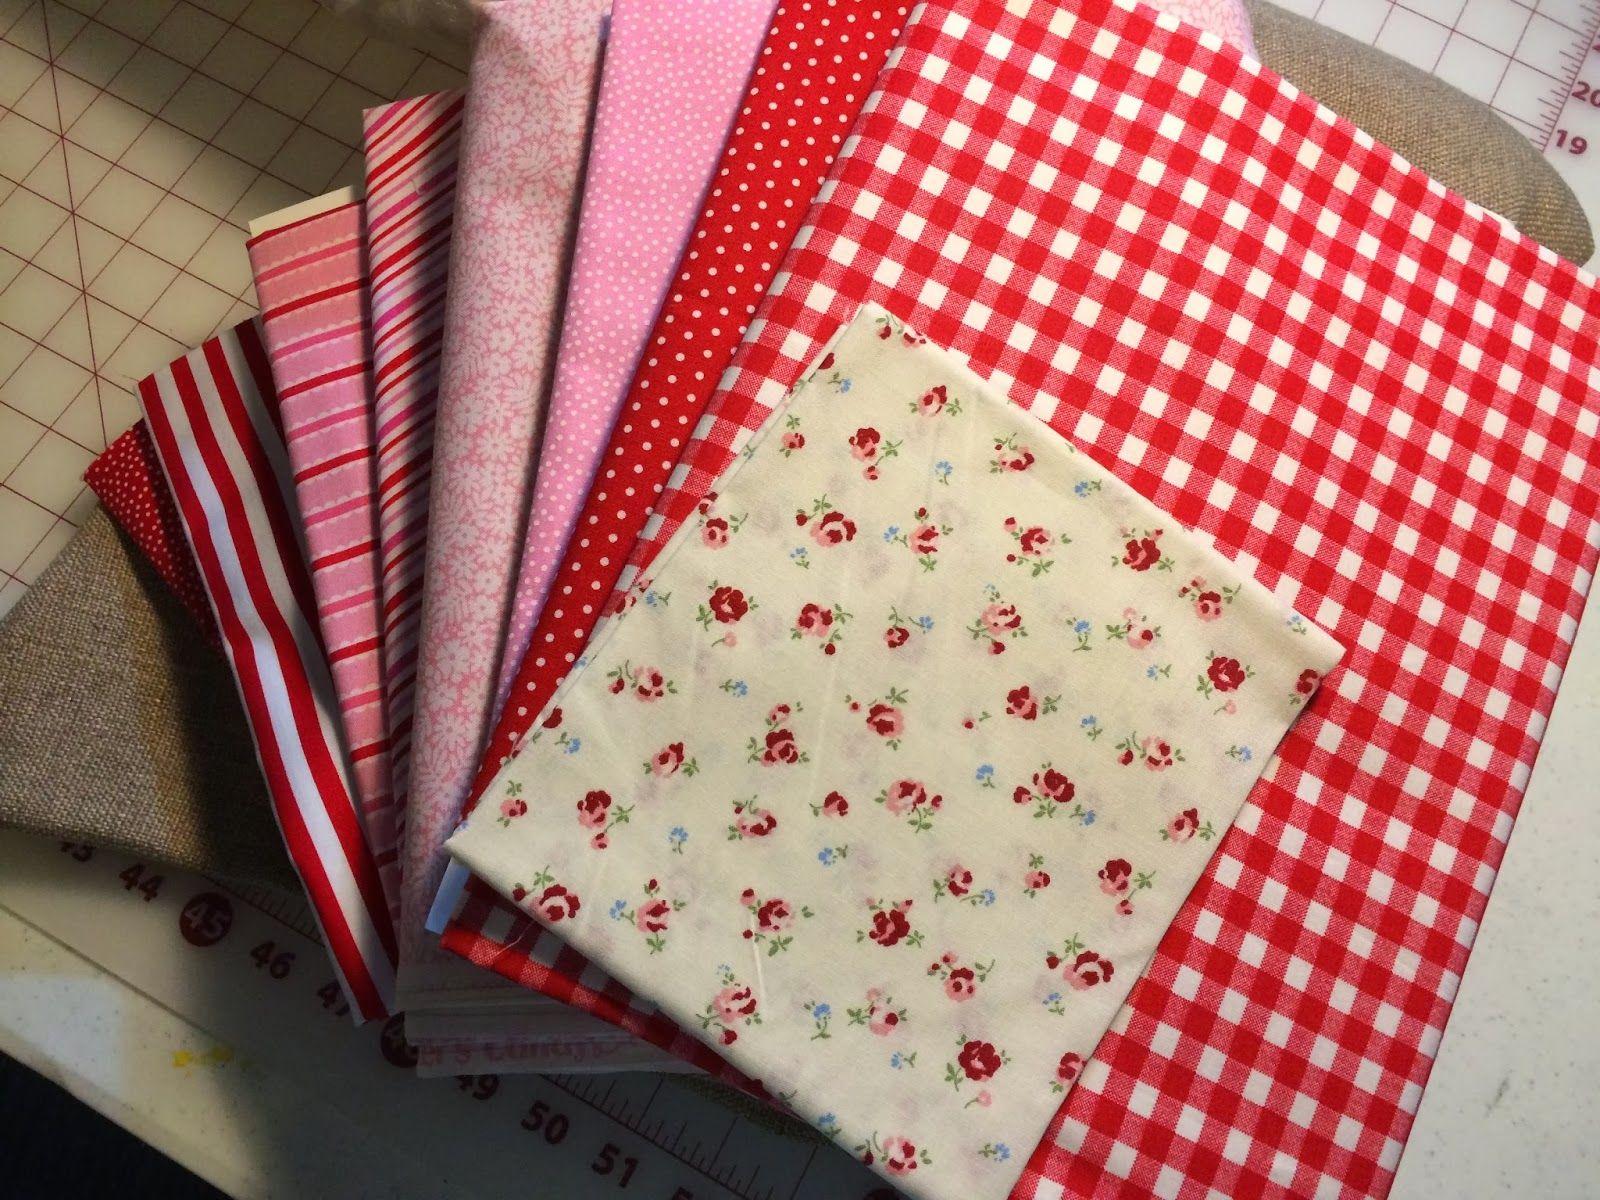 Holly Creates with Valentine Fabrics